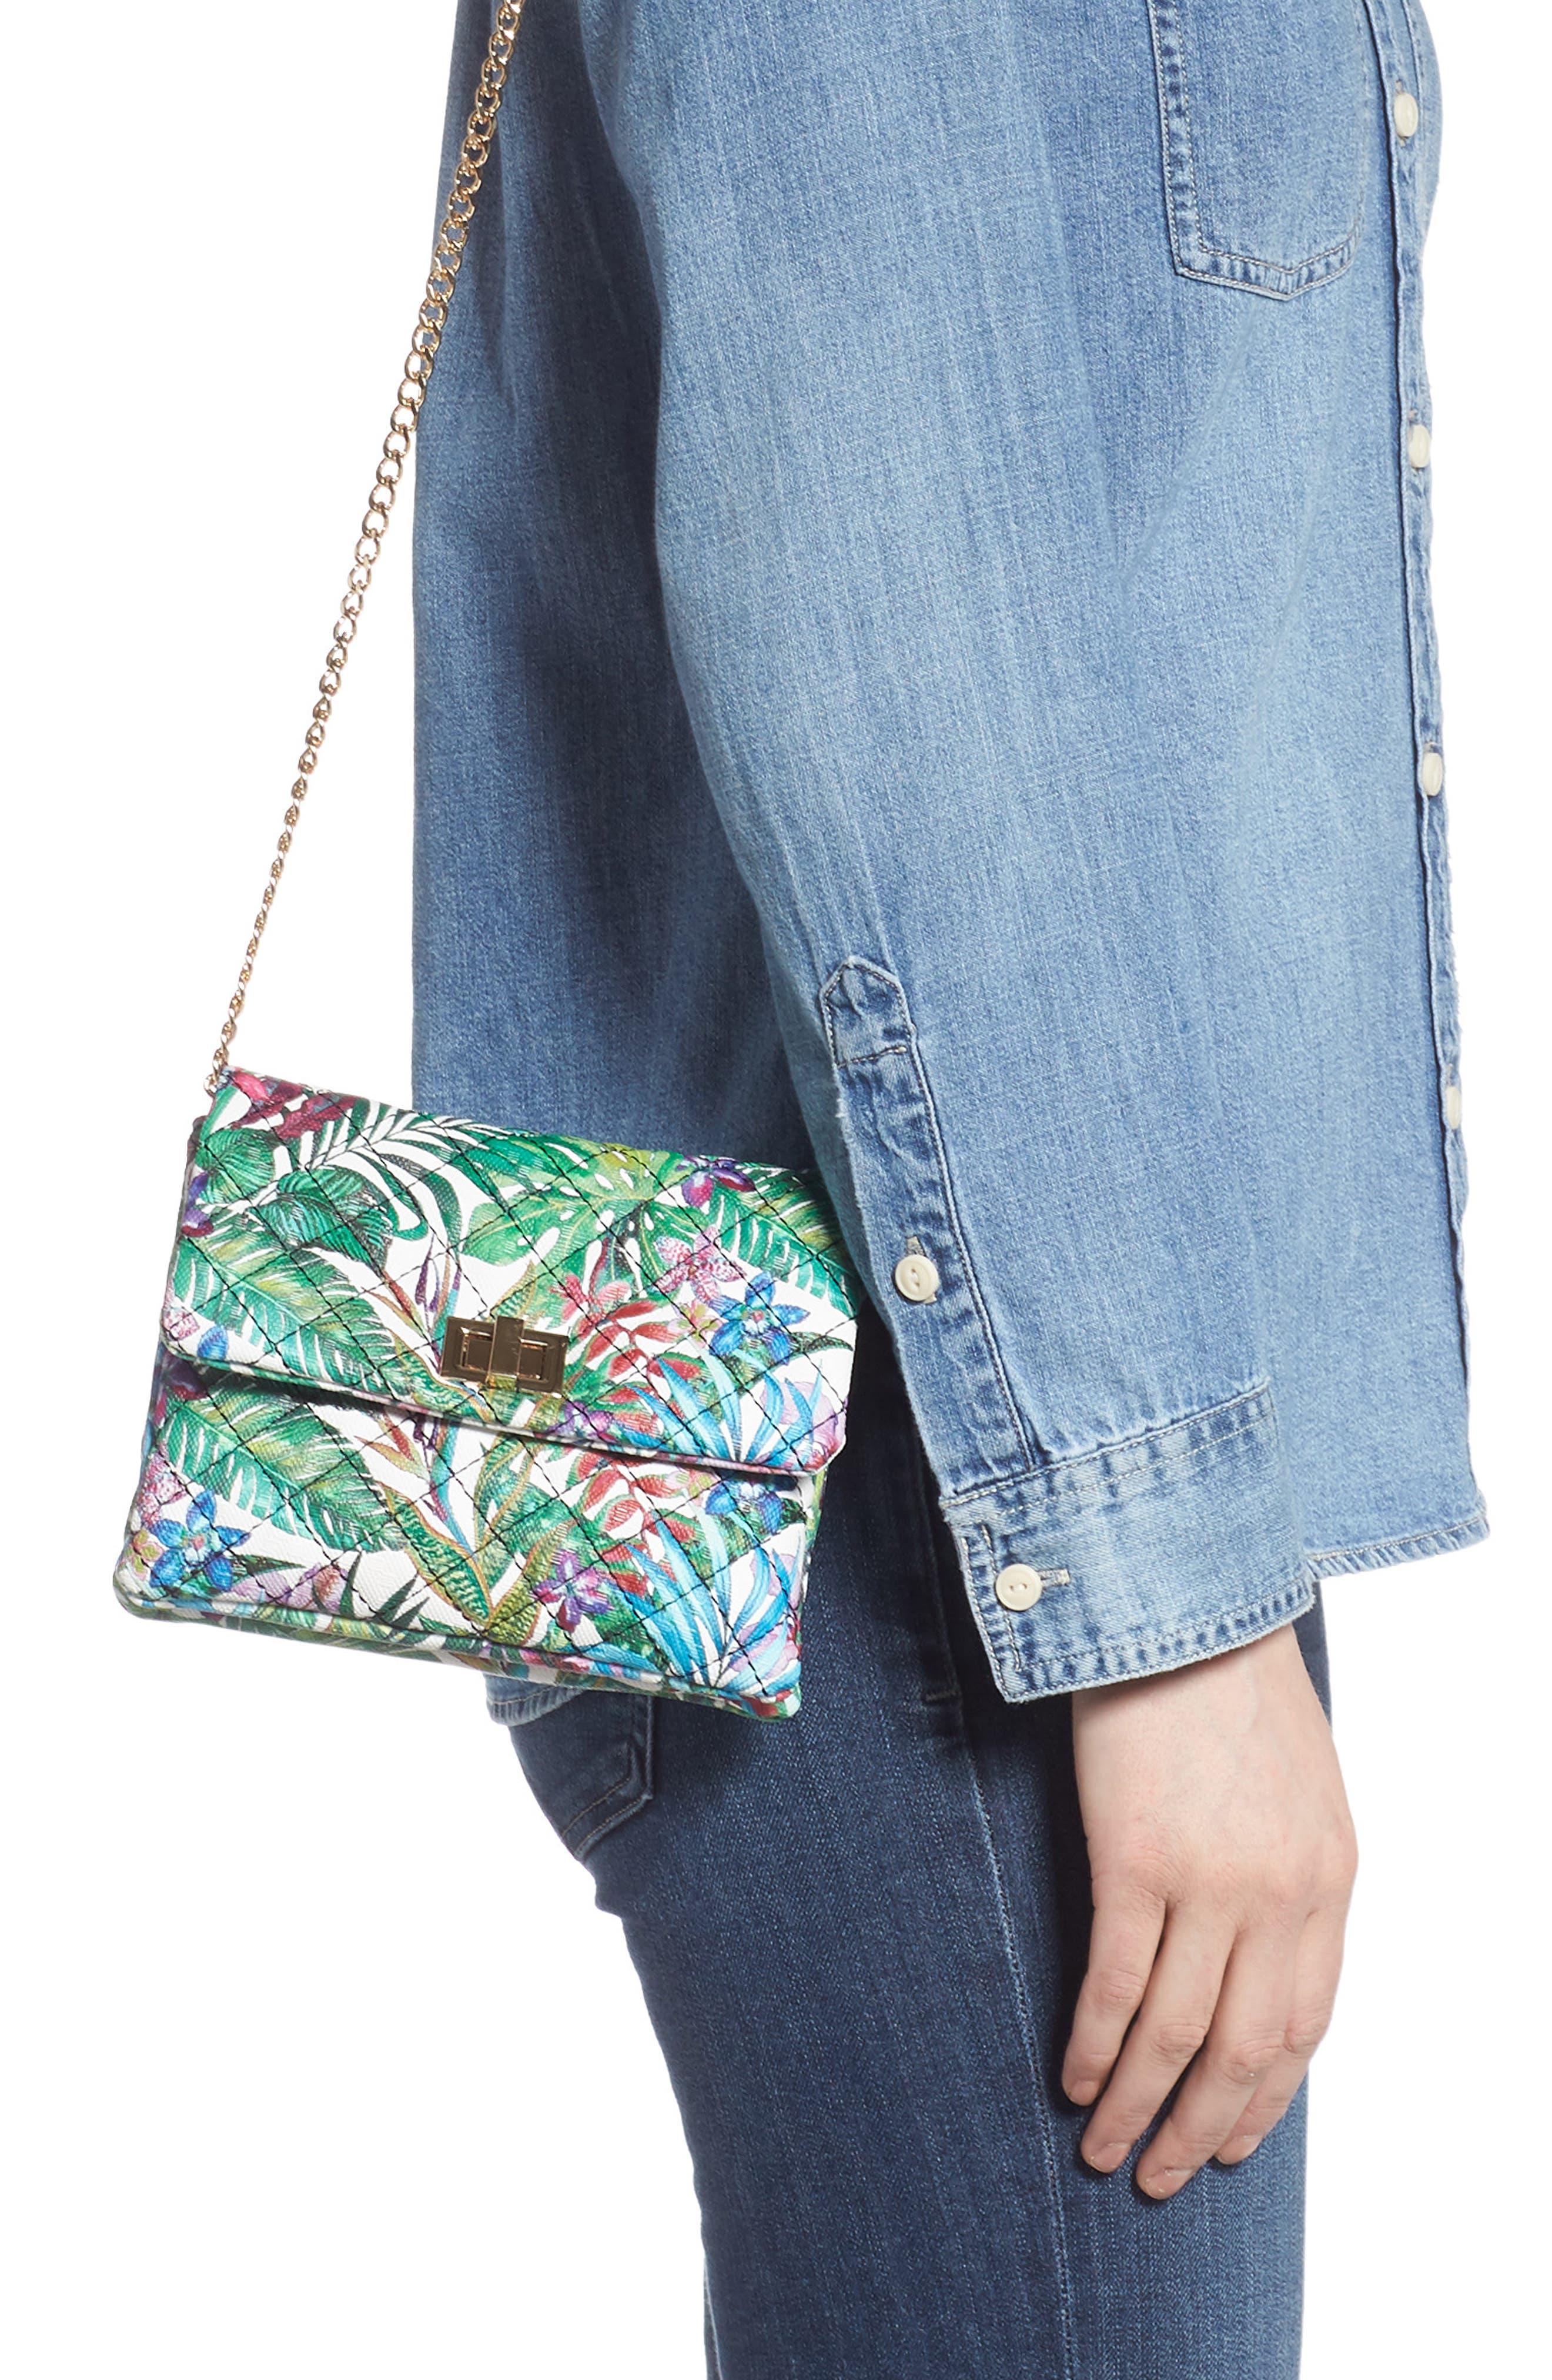 MALI + LILI, Quilted Vegan Leather Belt Bag, Alternate thumbnail 5, color, 101